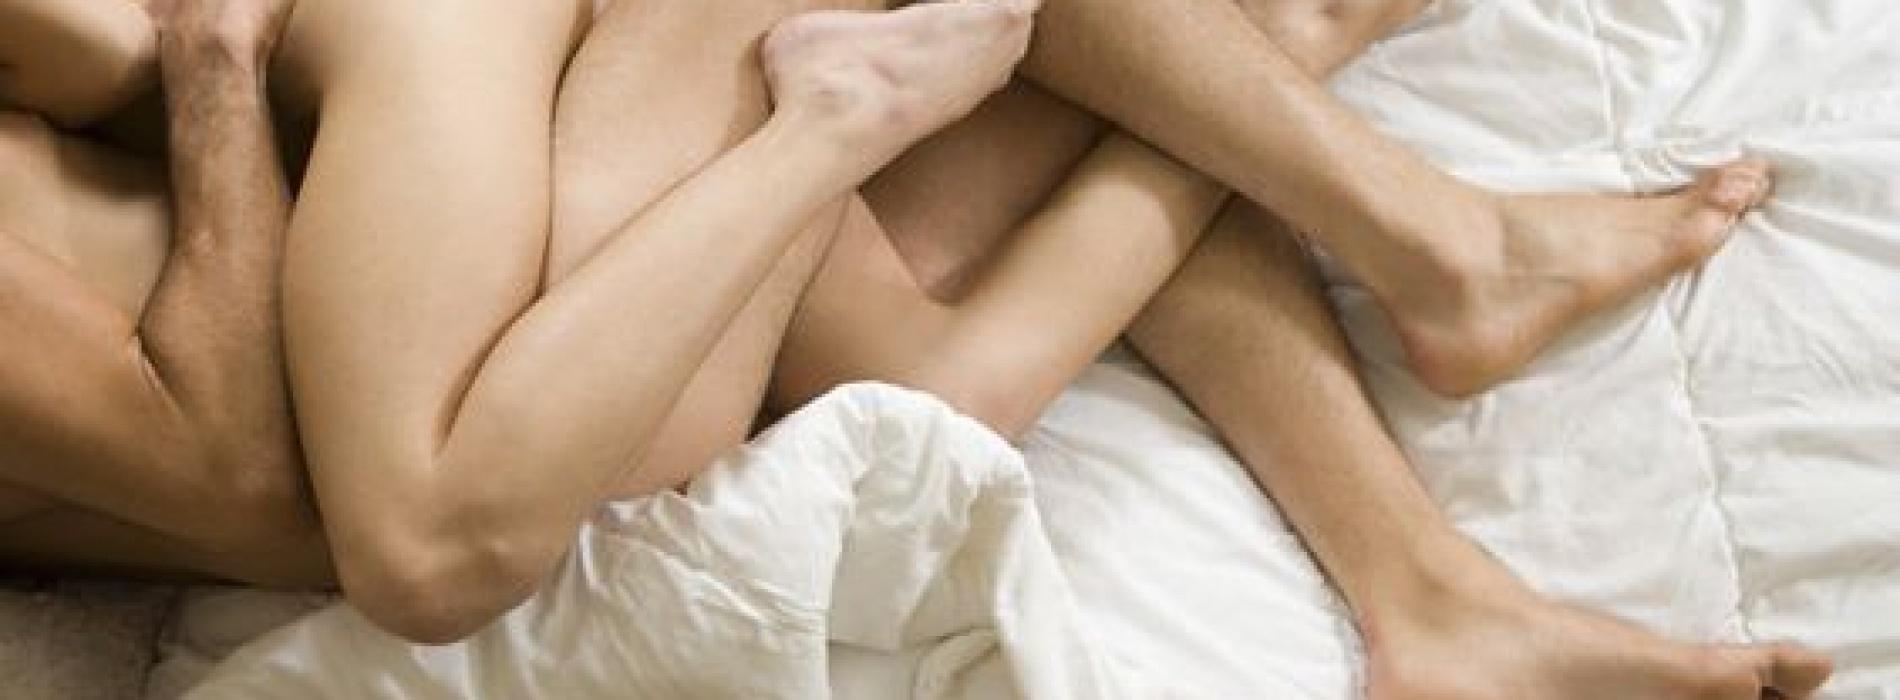 nu sexmassage pijpbeurt